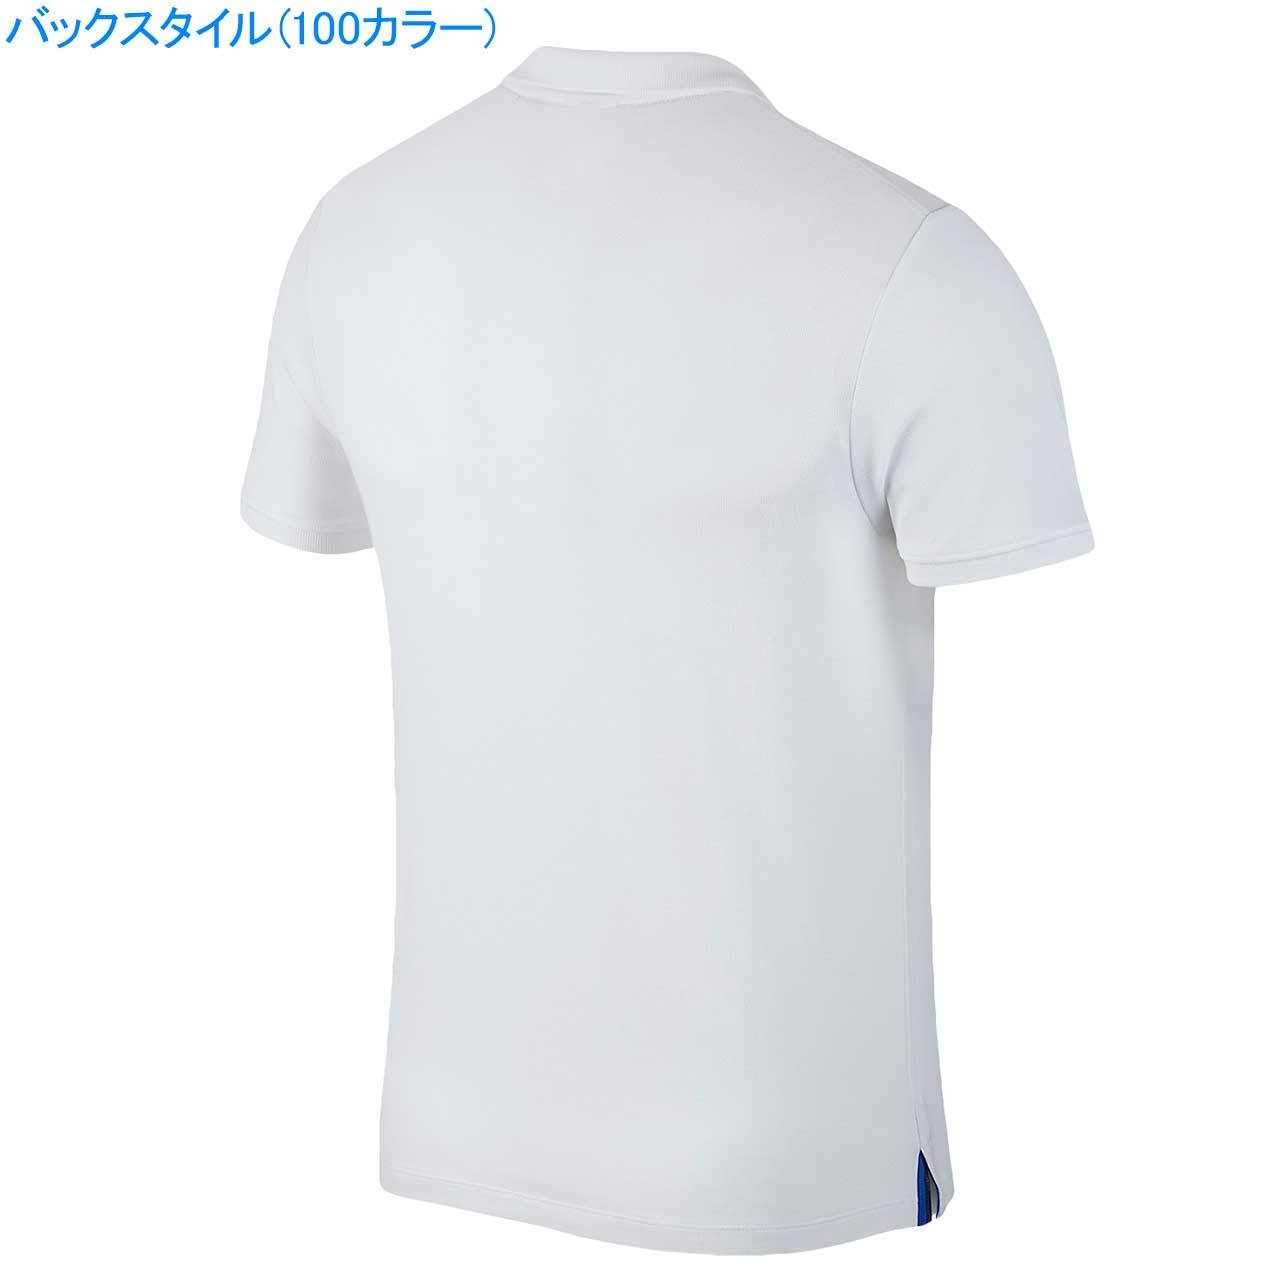 Nike RF M Nkct Polo Essential Shirt de Tenis, Hombre: Amazon.es: Deportes y aire libre